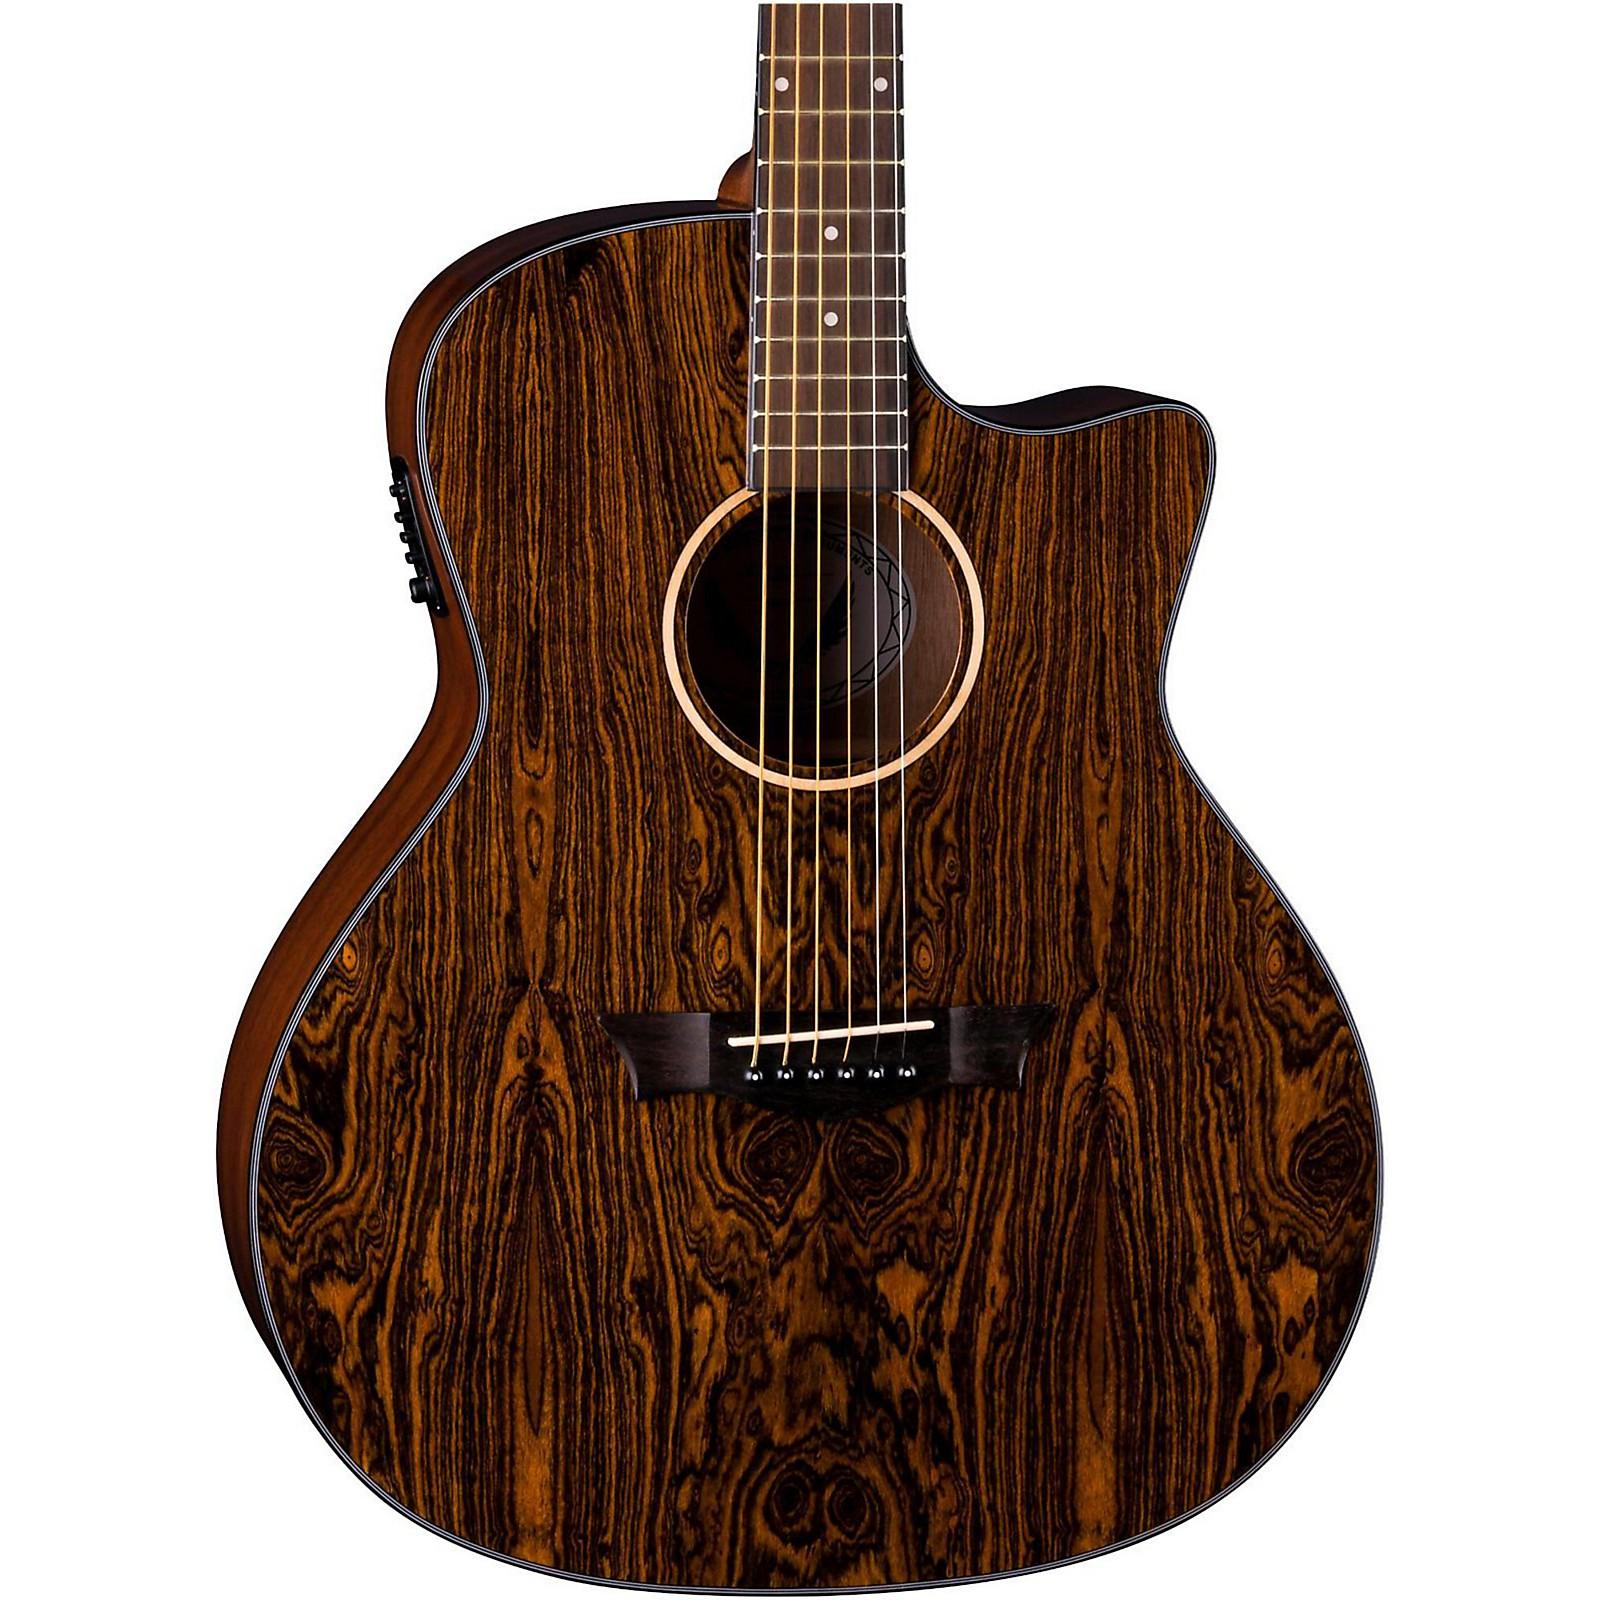 Dean Axs Exotic Gloss Cadie Cutaway Acoustic-Electric Guitar